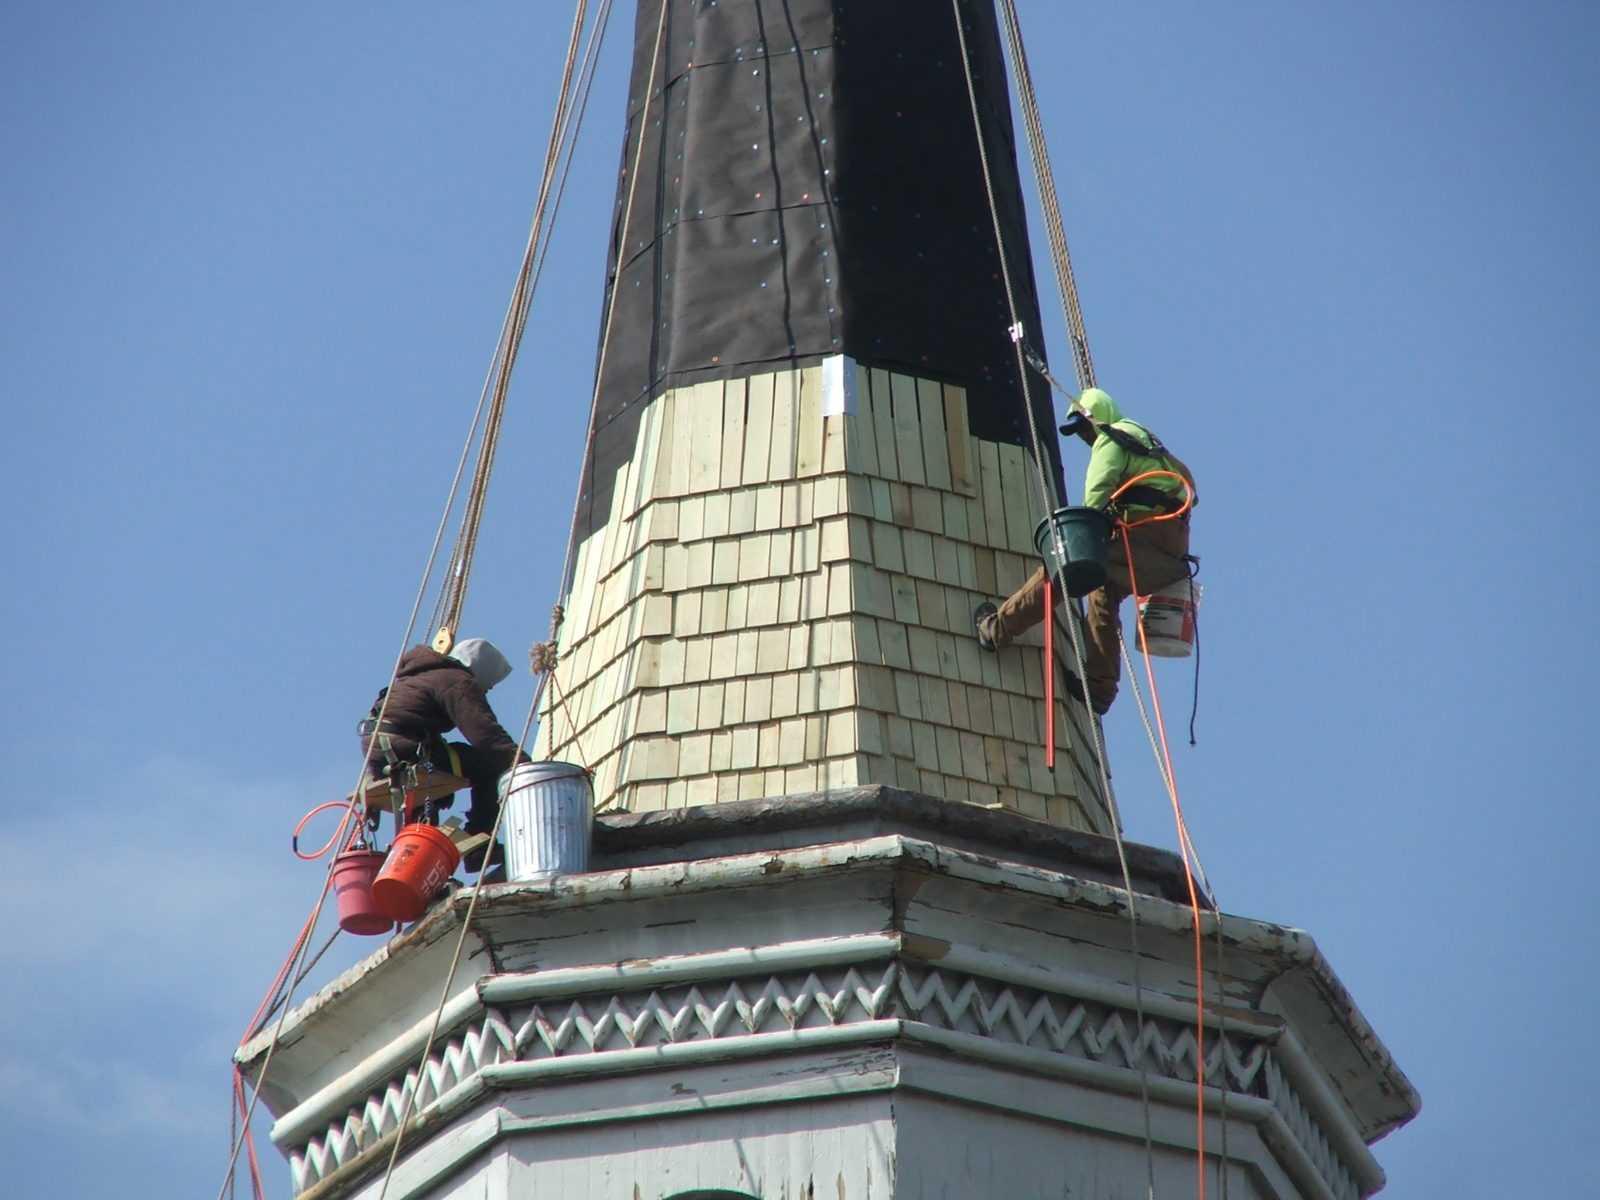 Installing wood shakes to steeple